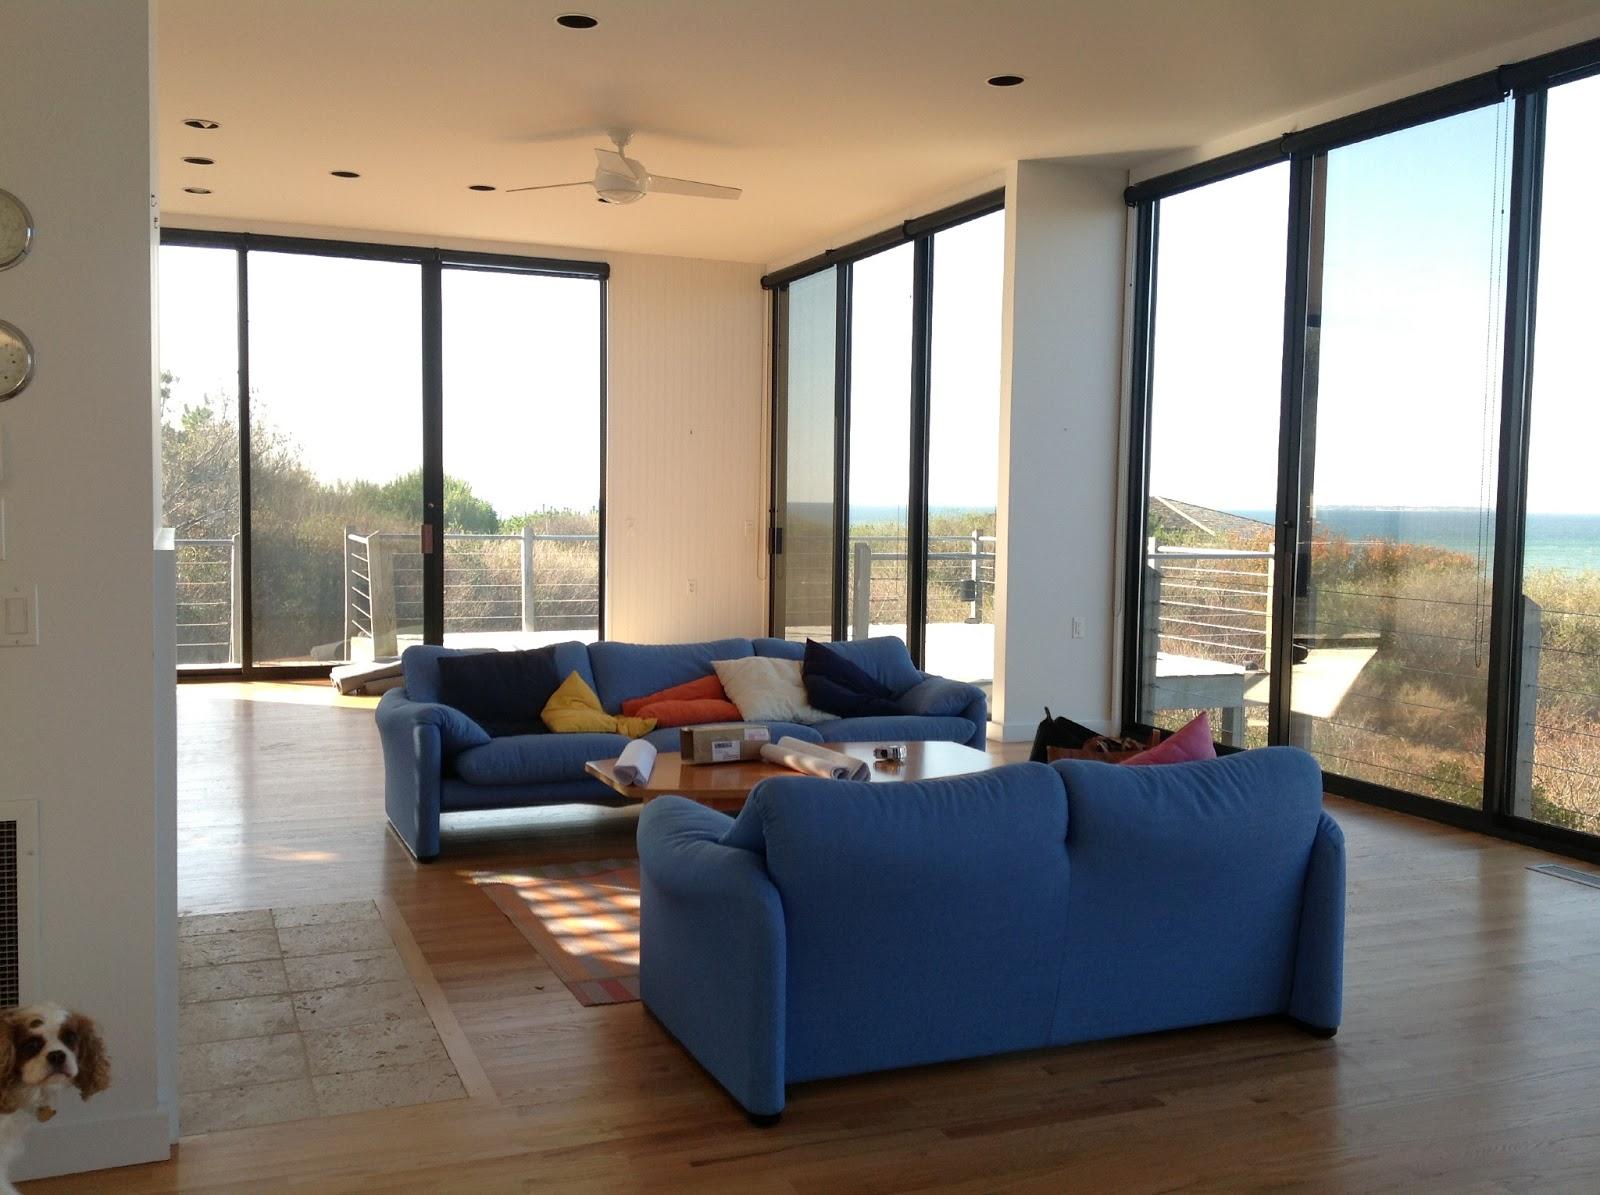 home design interior project sneak peek cape cod beach house